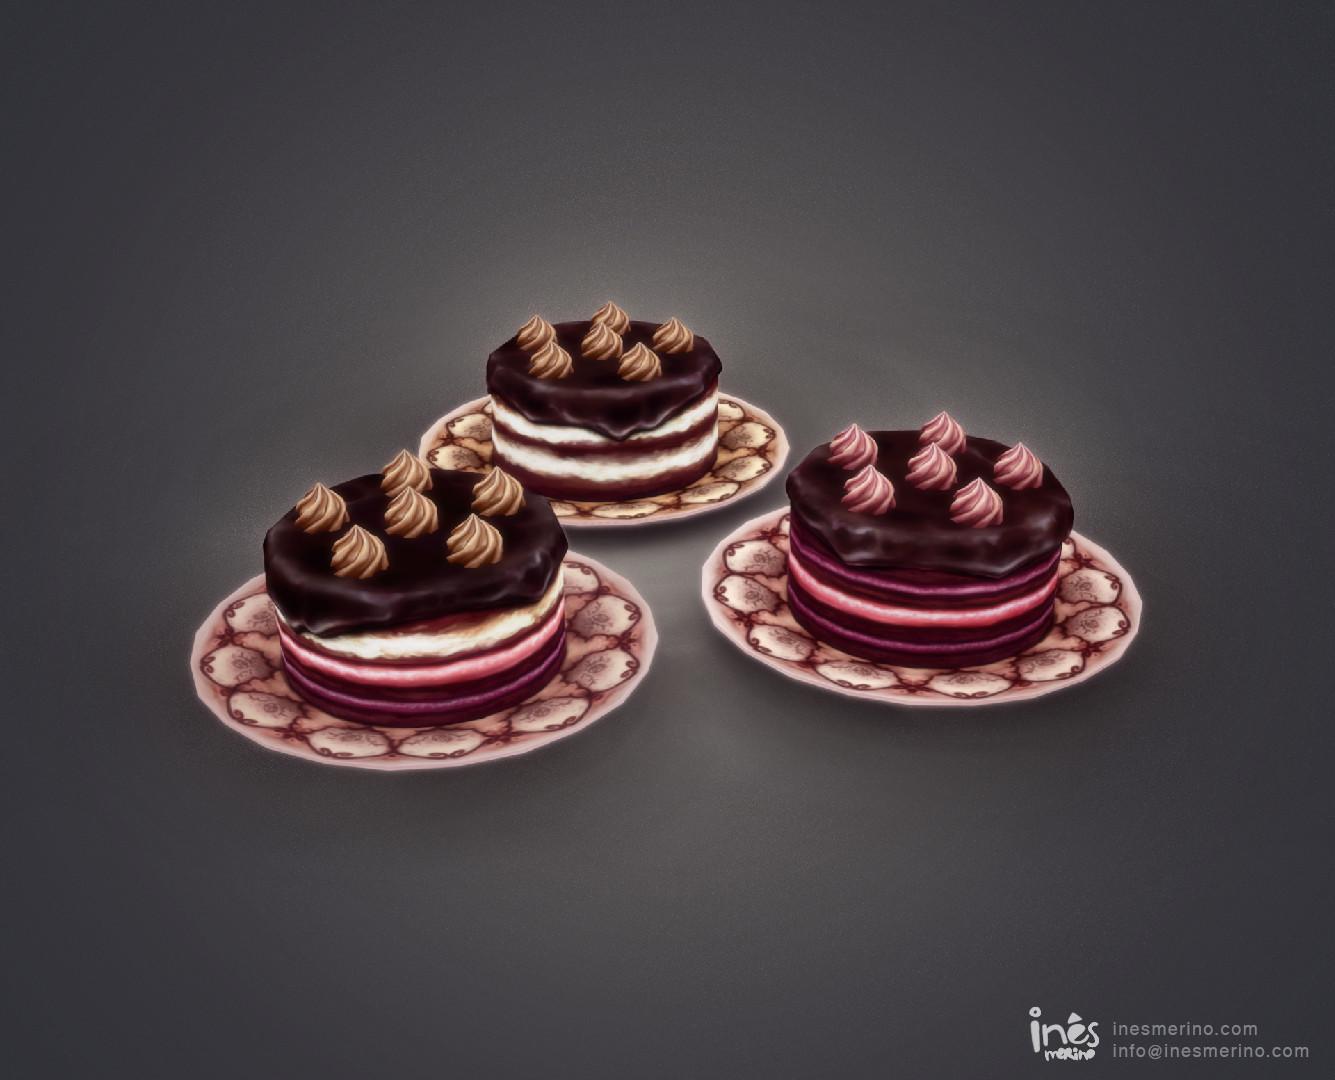 Ines merino 1806 cake02 presentation2